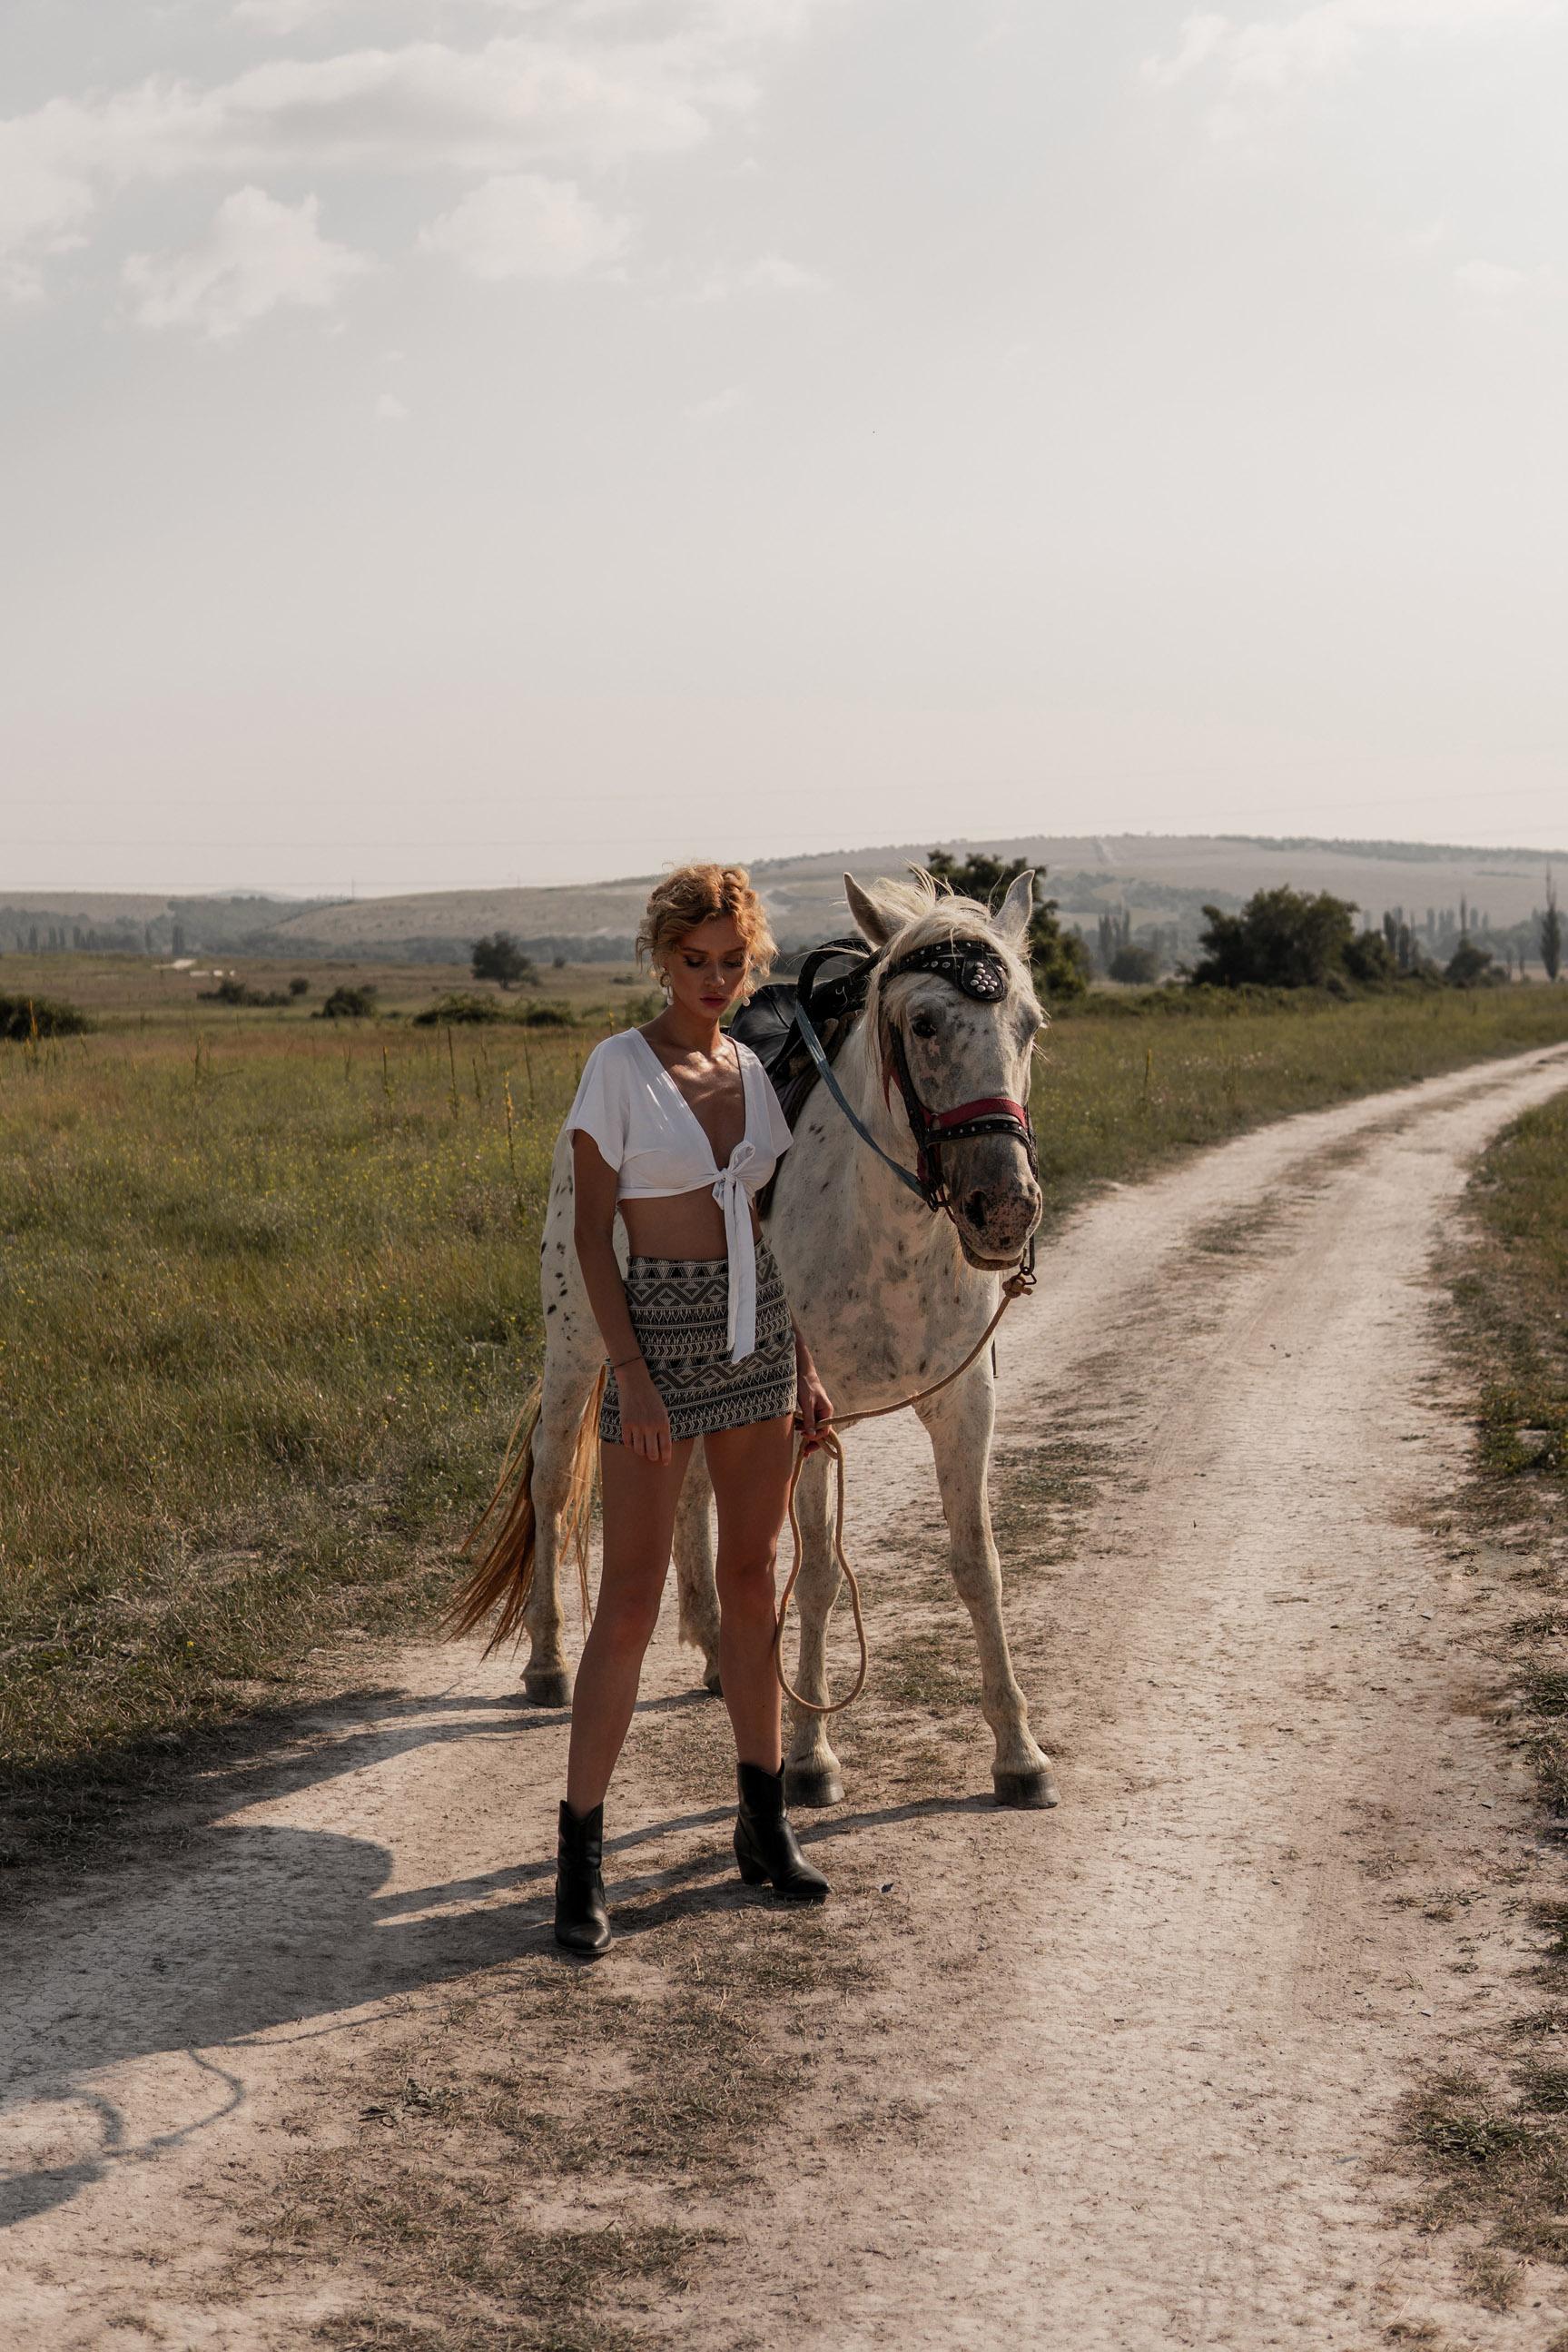 Девушка и лошадь / Даша Степанова в журнале Picton / фото 02